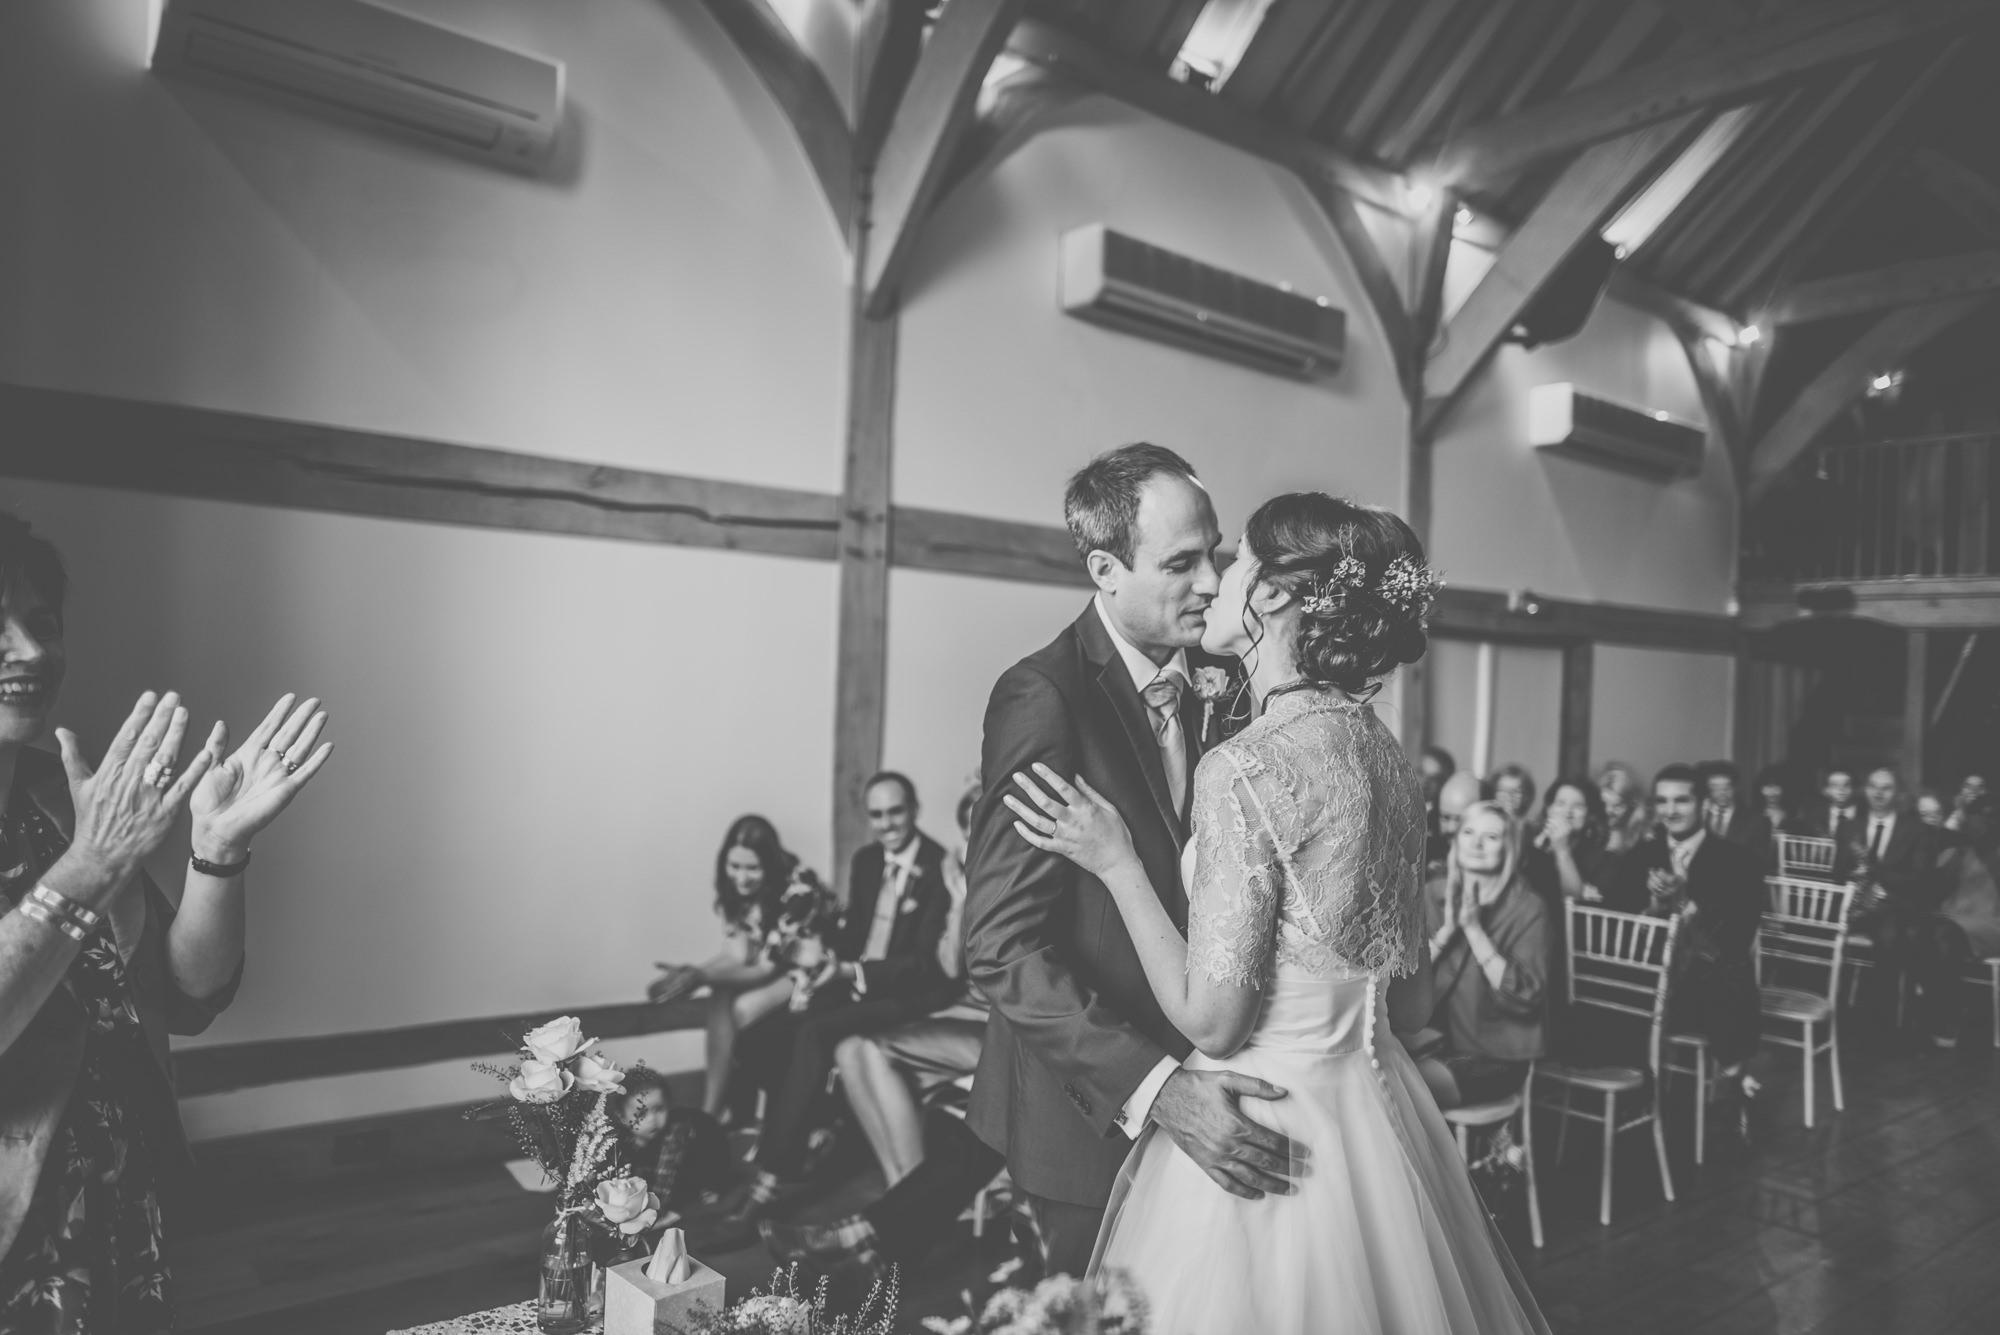 Charisse-and-James-wedding-in-Cain-Manor-Venue-Hampshire-Manu-Mendoza-Wedding-Photography-276.jpg